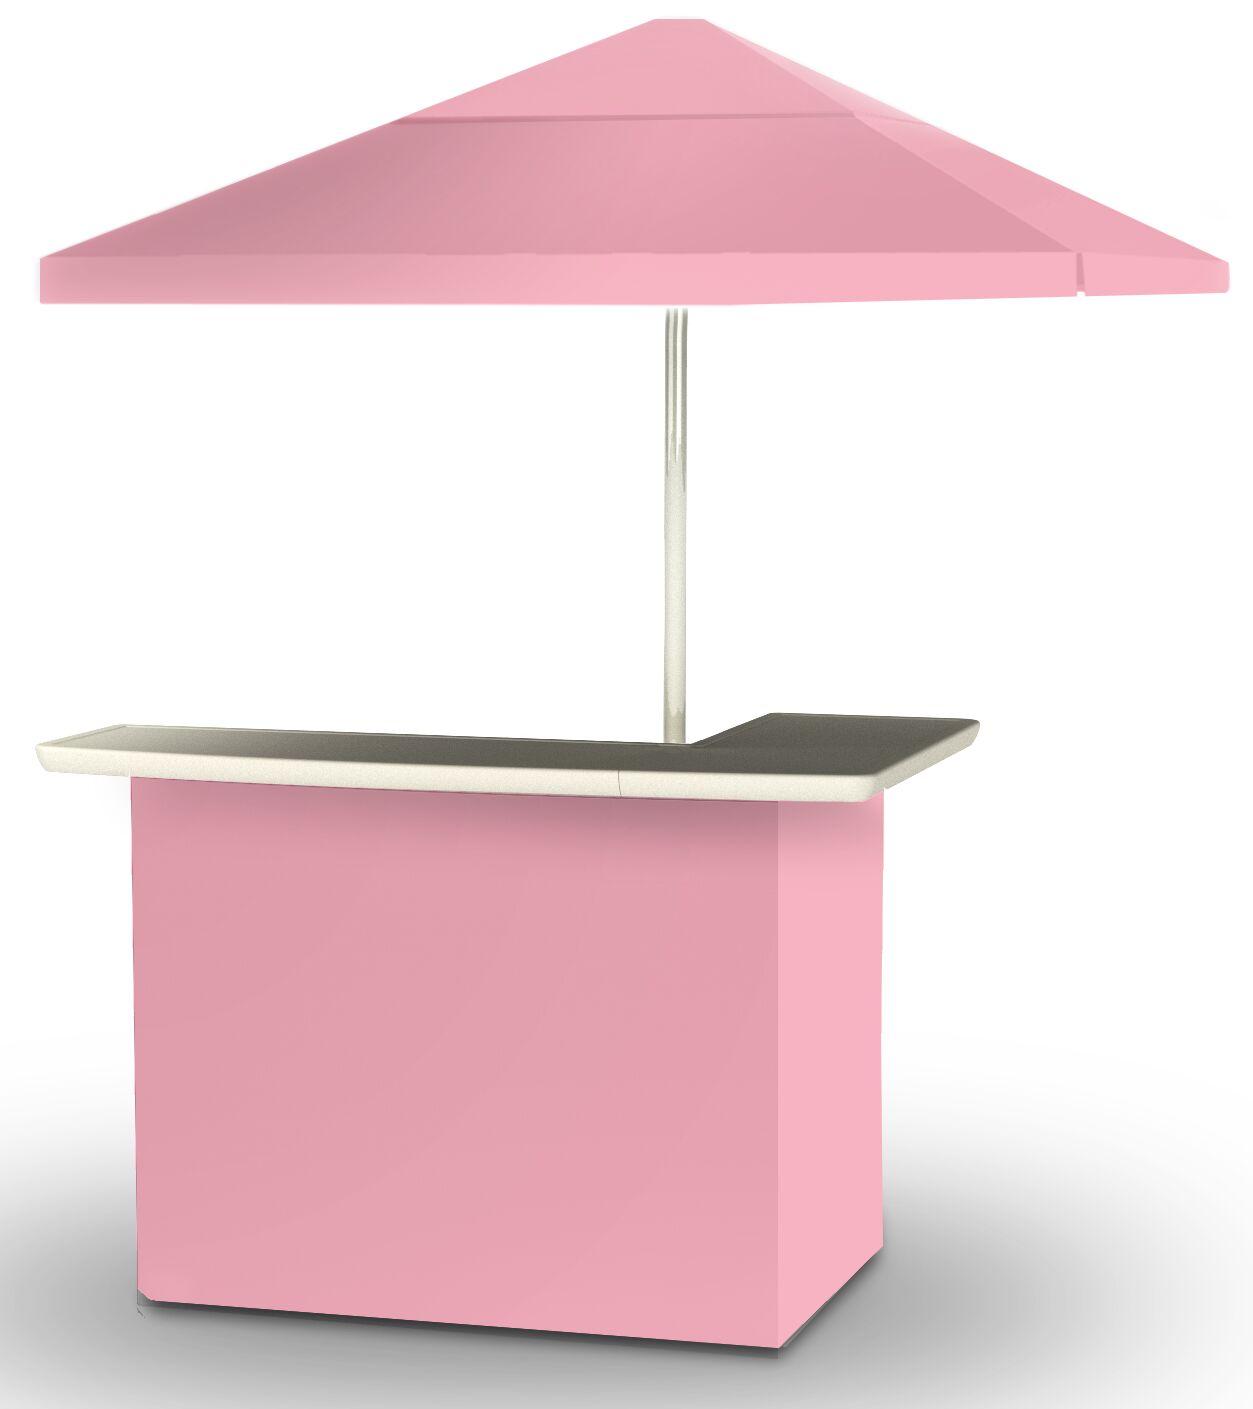 2 Piece Patio Home bar Finish: Pink